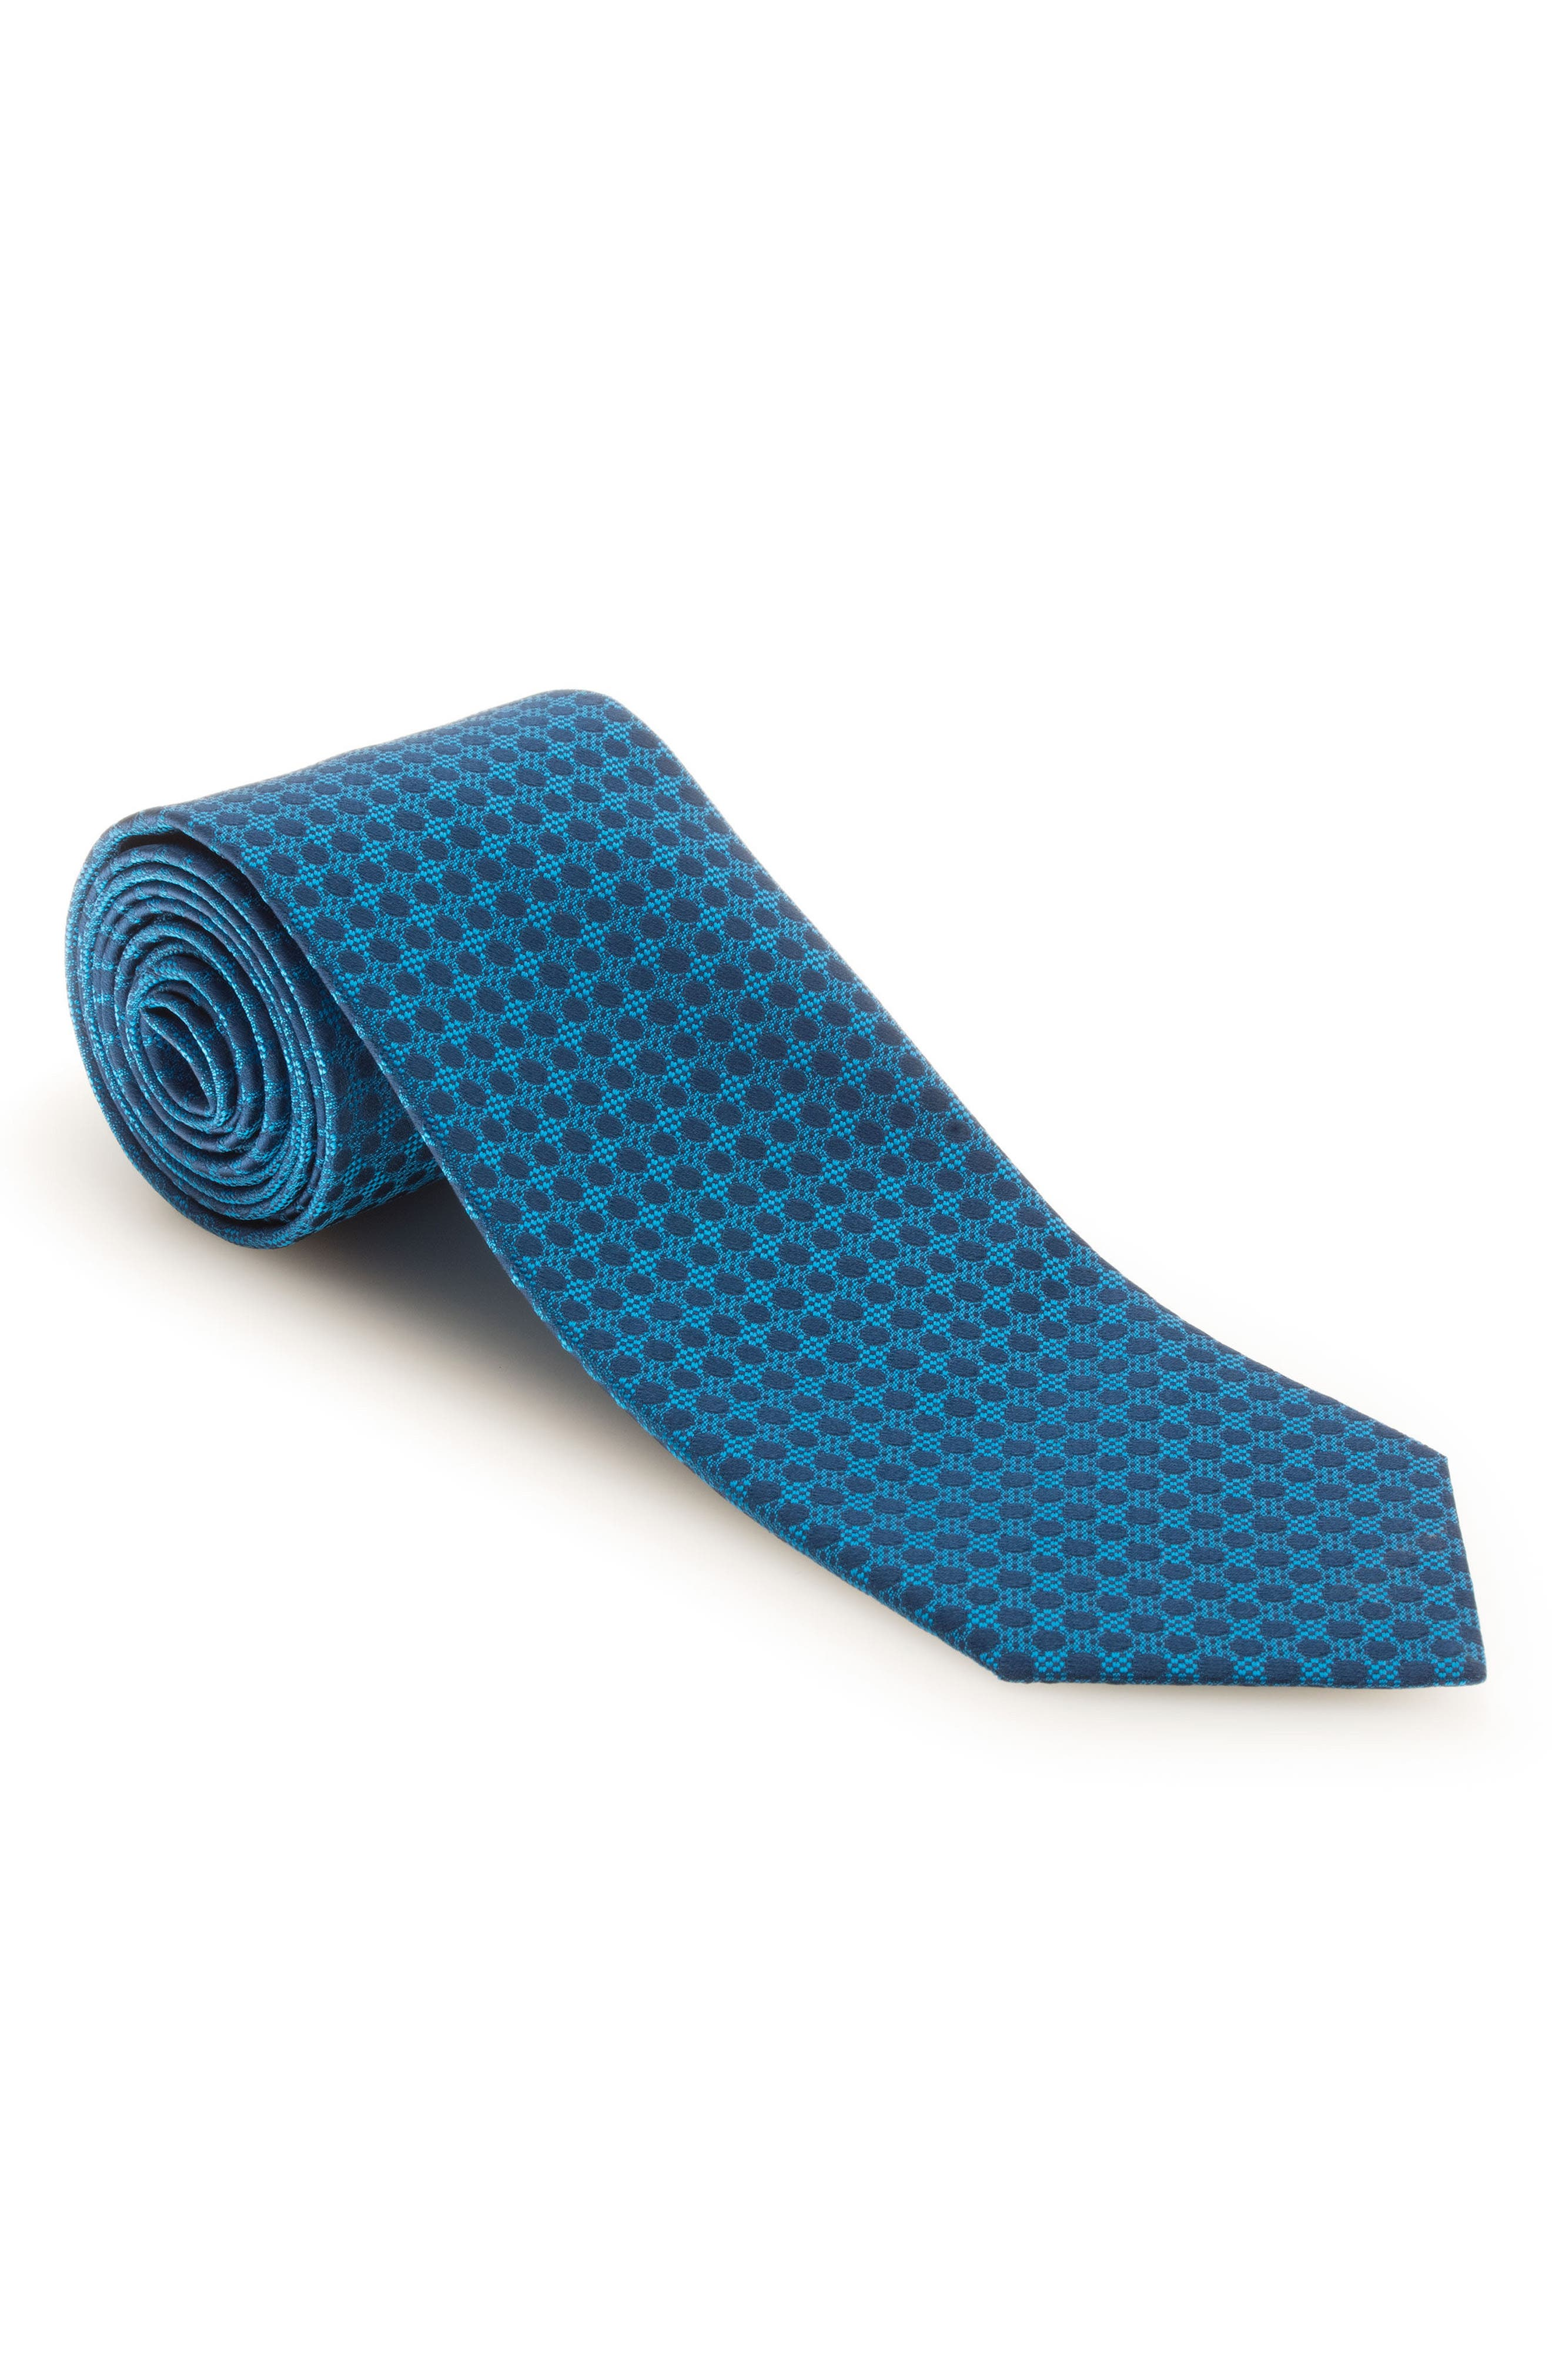 Alternate Image 1 Selected - Robert Talbott Dot Silk Tie